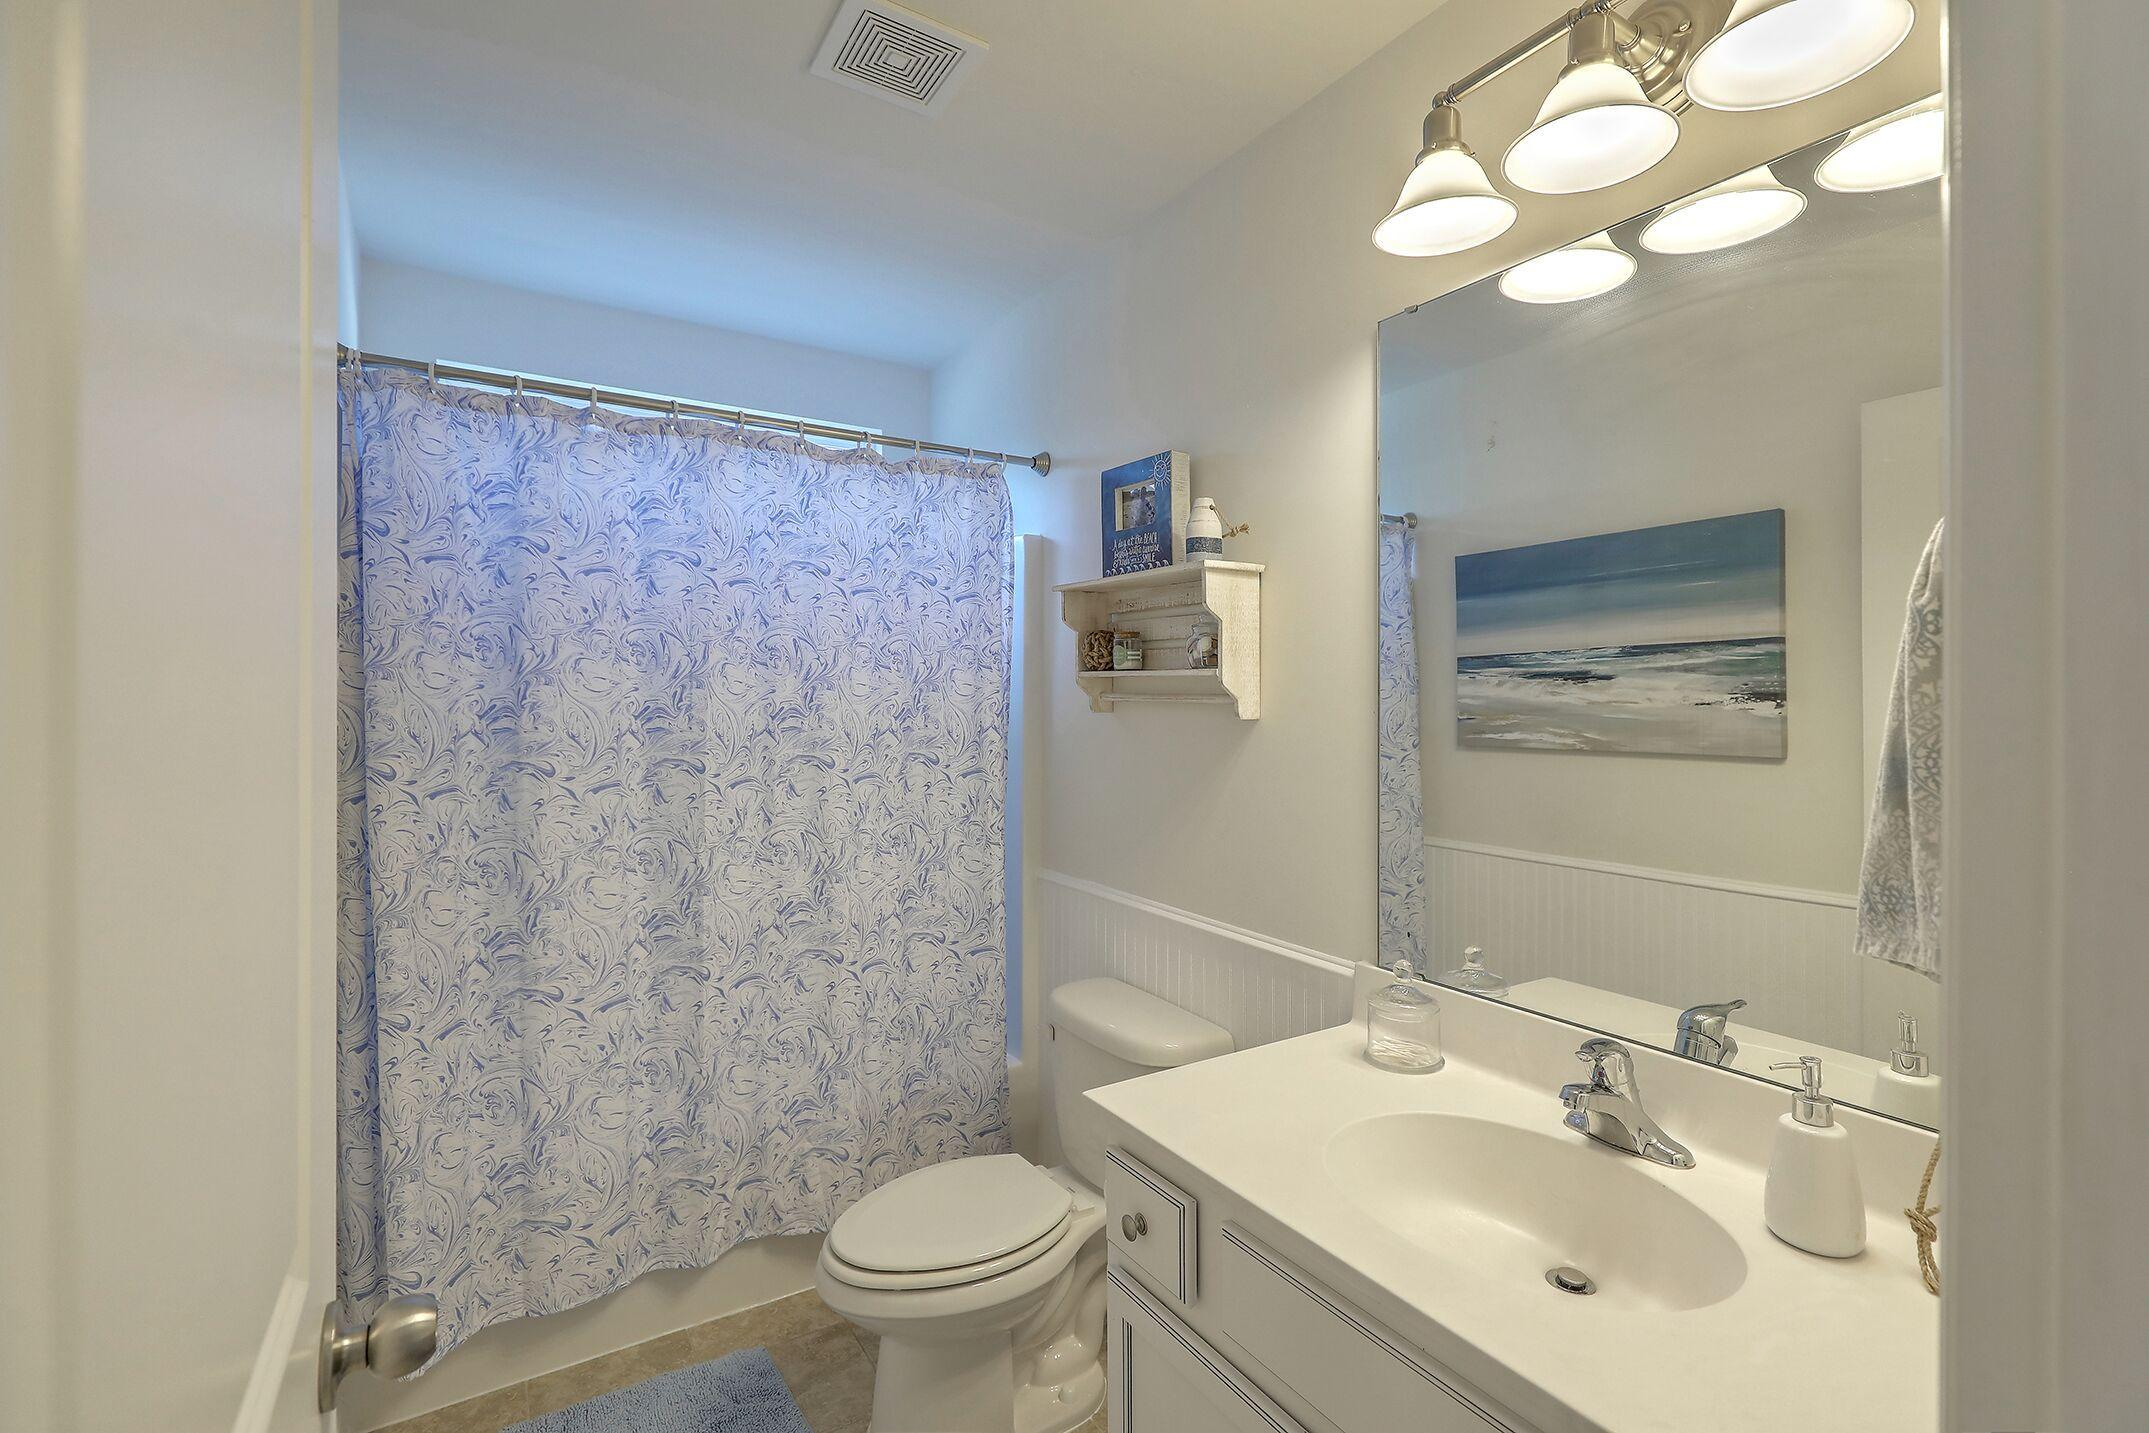 Copahee Landing Homes For Sale - 3731 Copahee Sound, Mount Pleasant, SC - 13